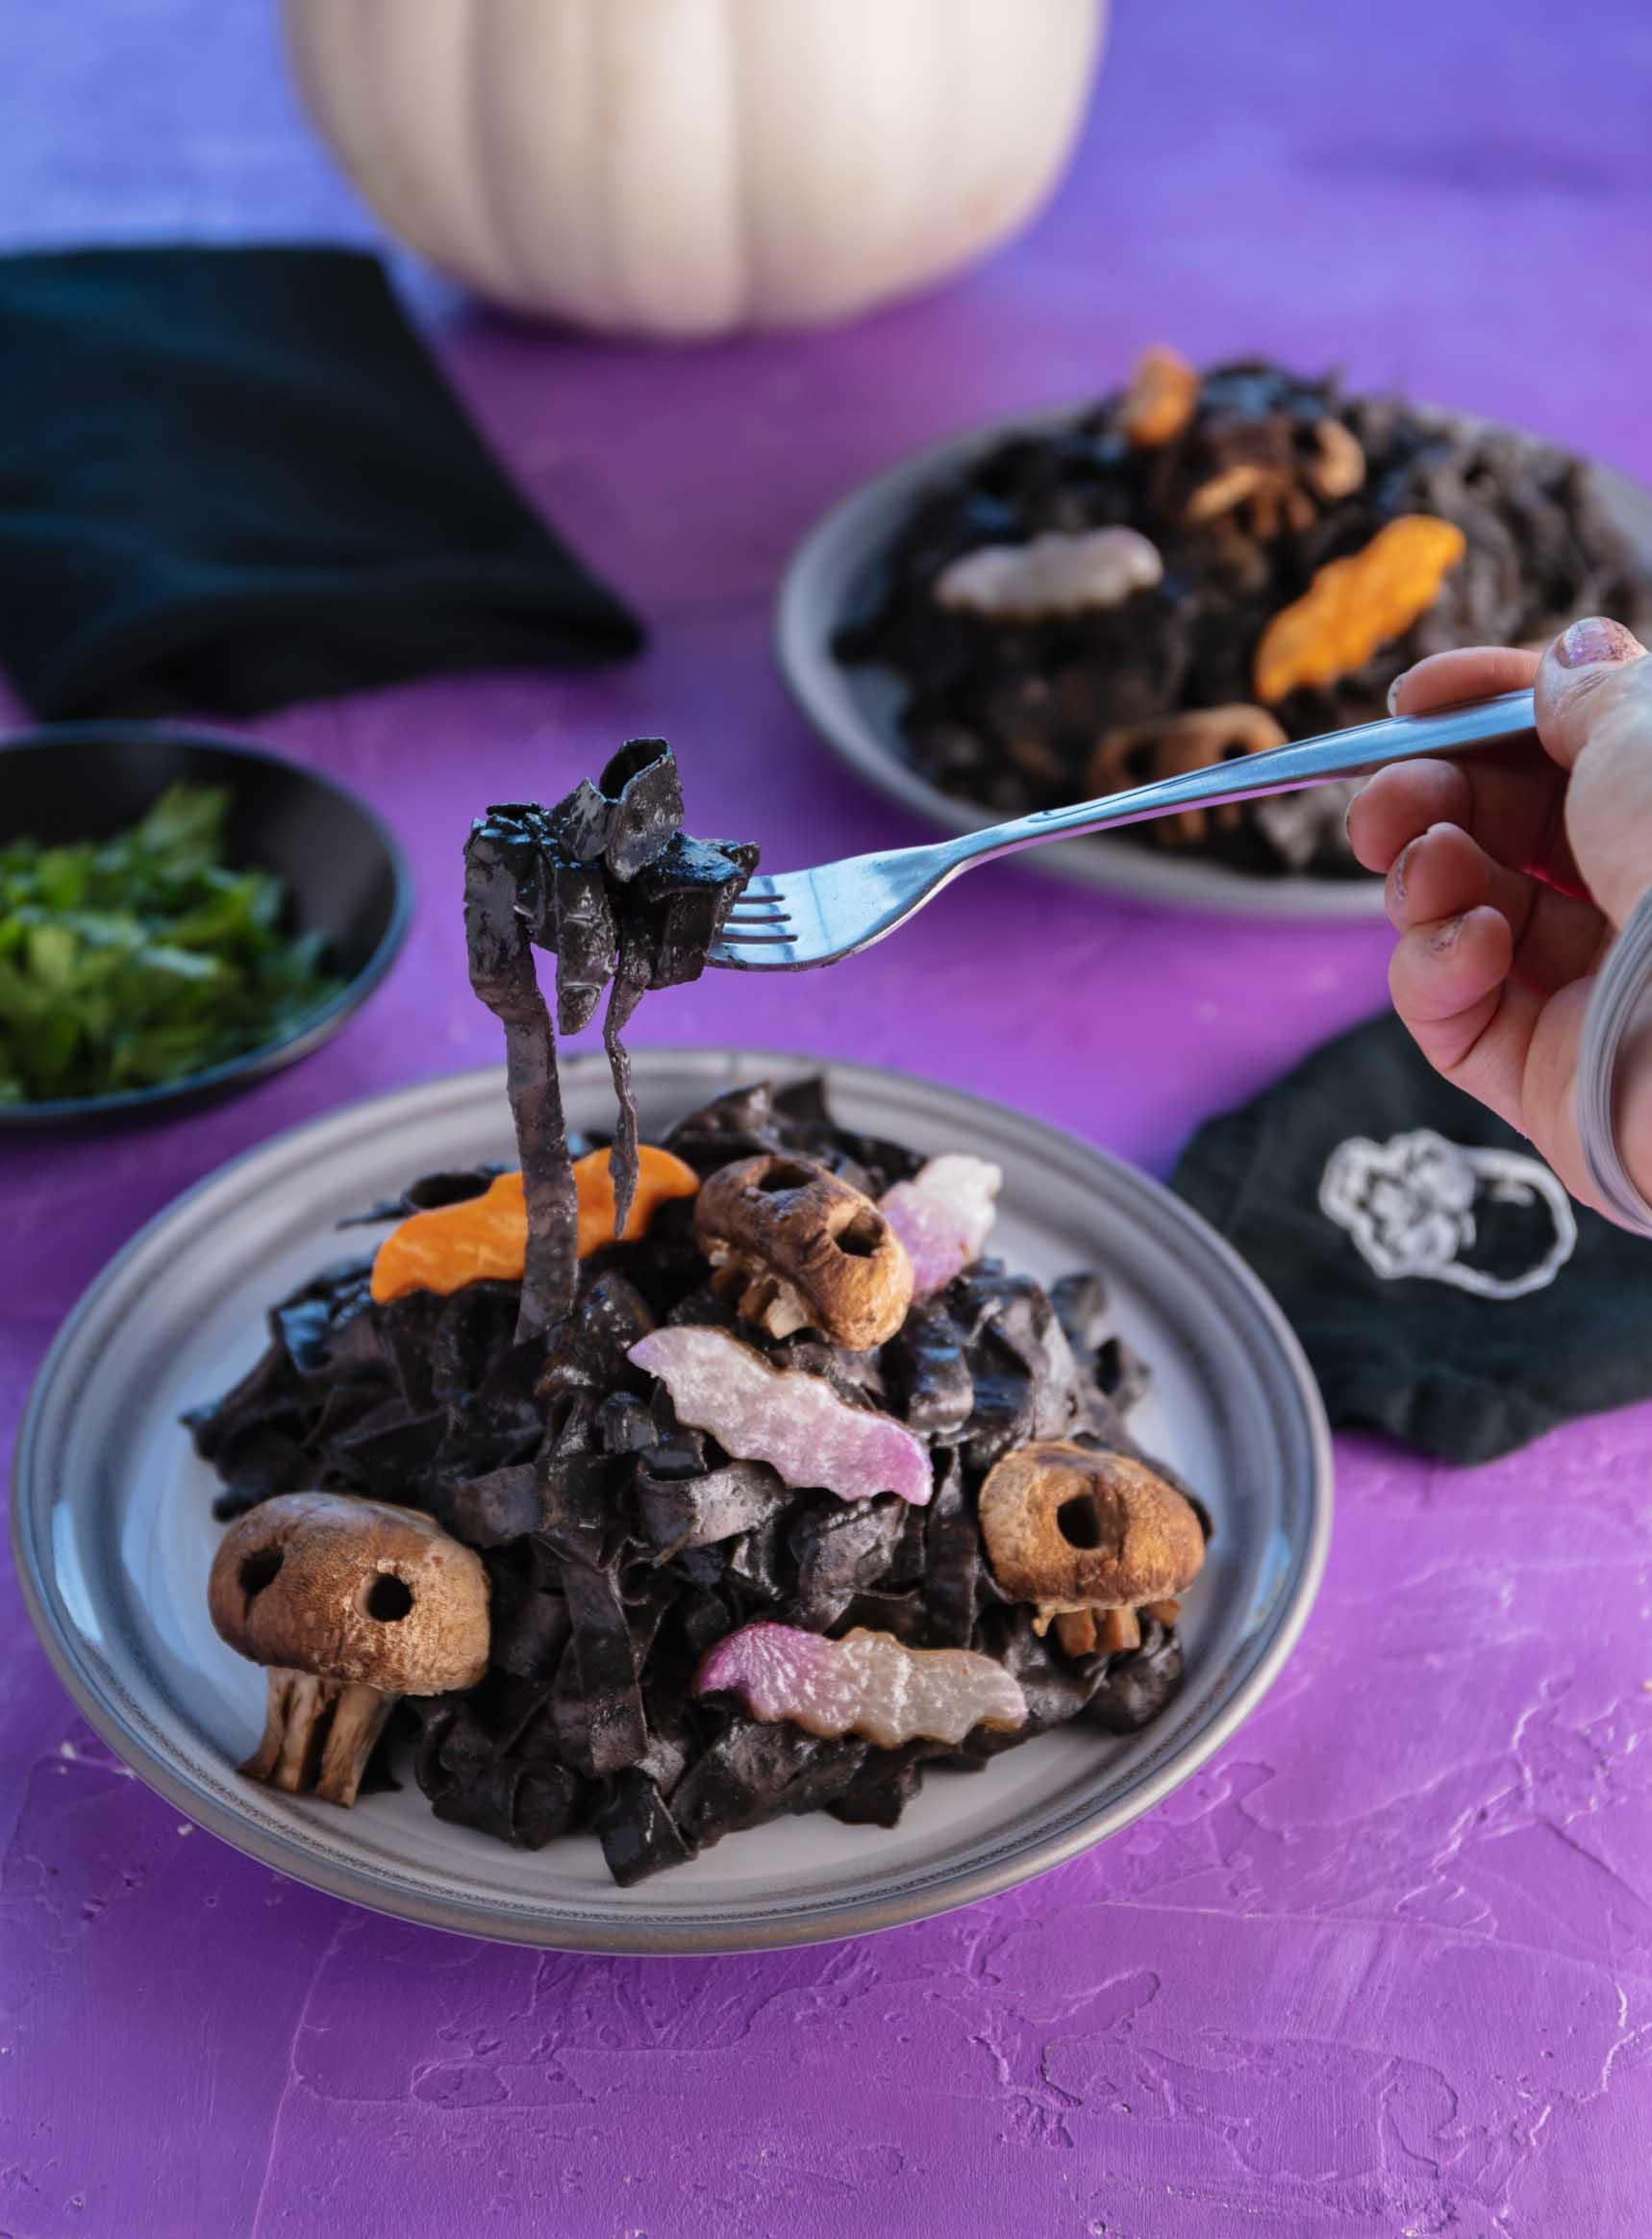 taking a bite of black halloween pasta with veggie bats and skull mushrooms